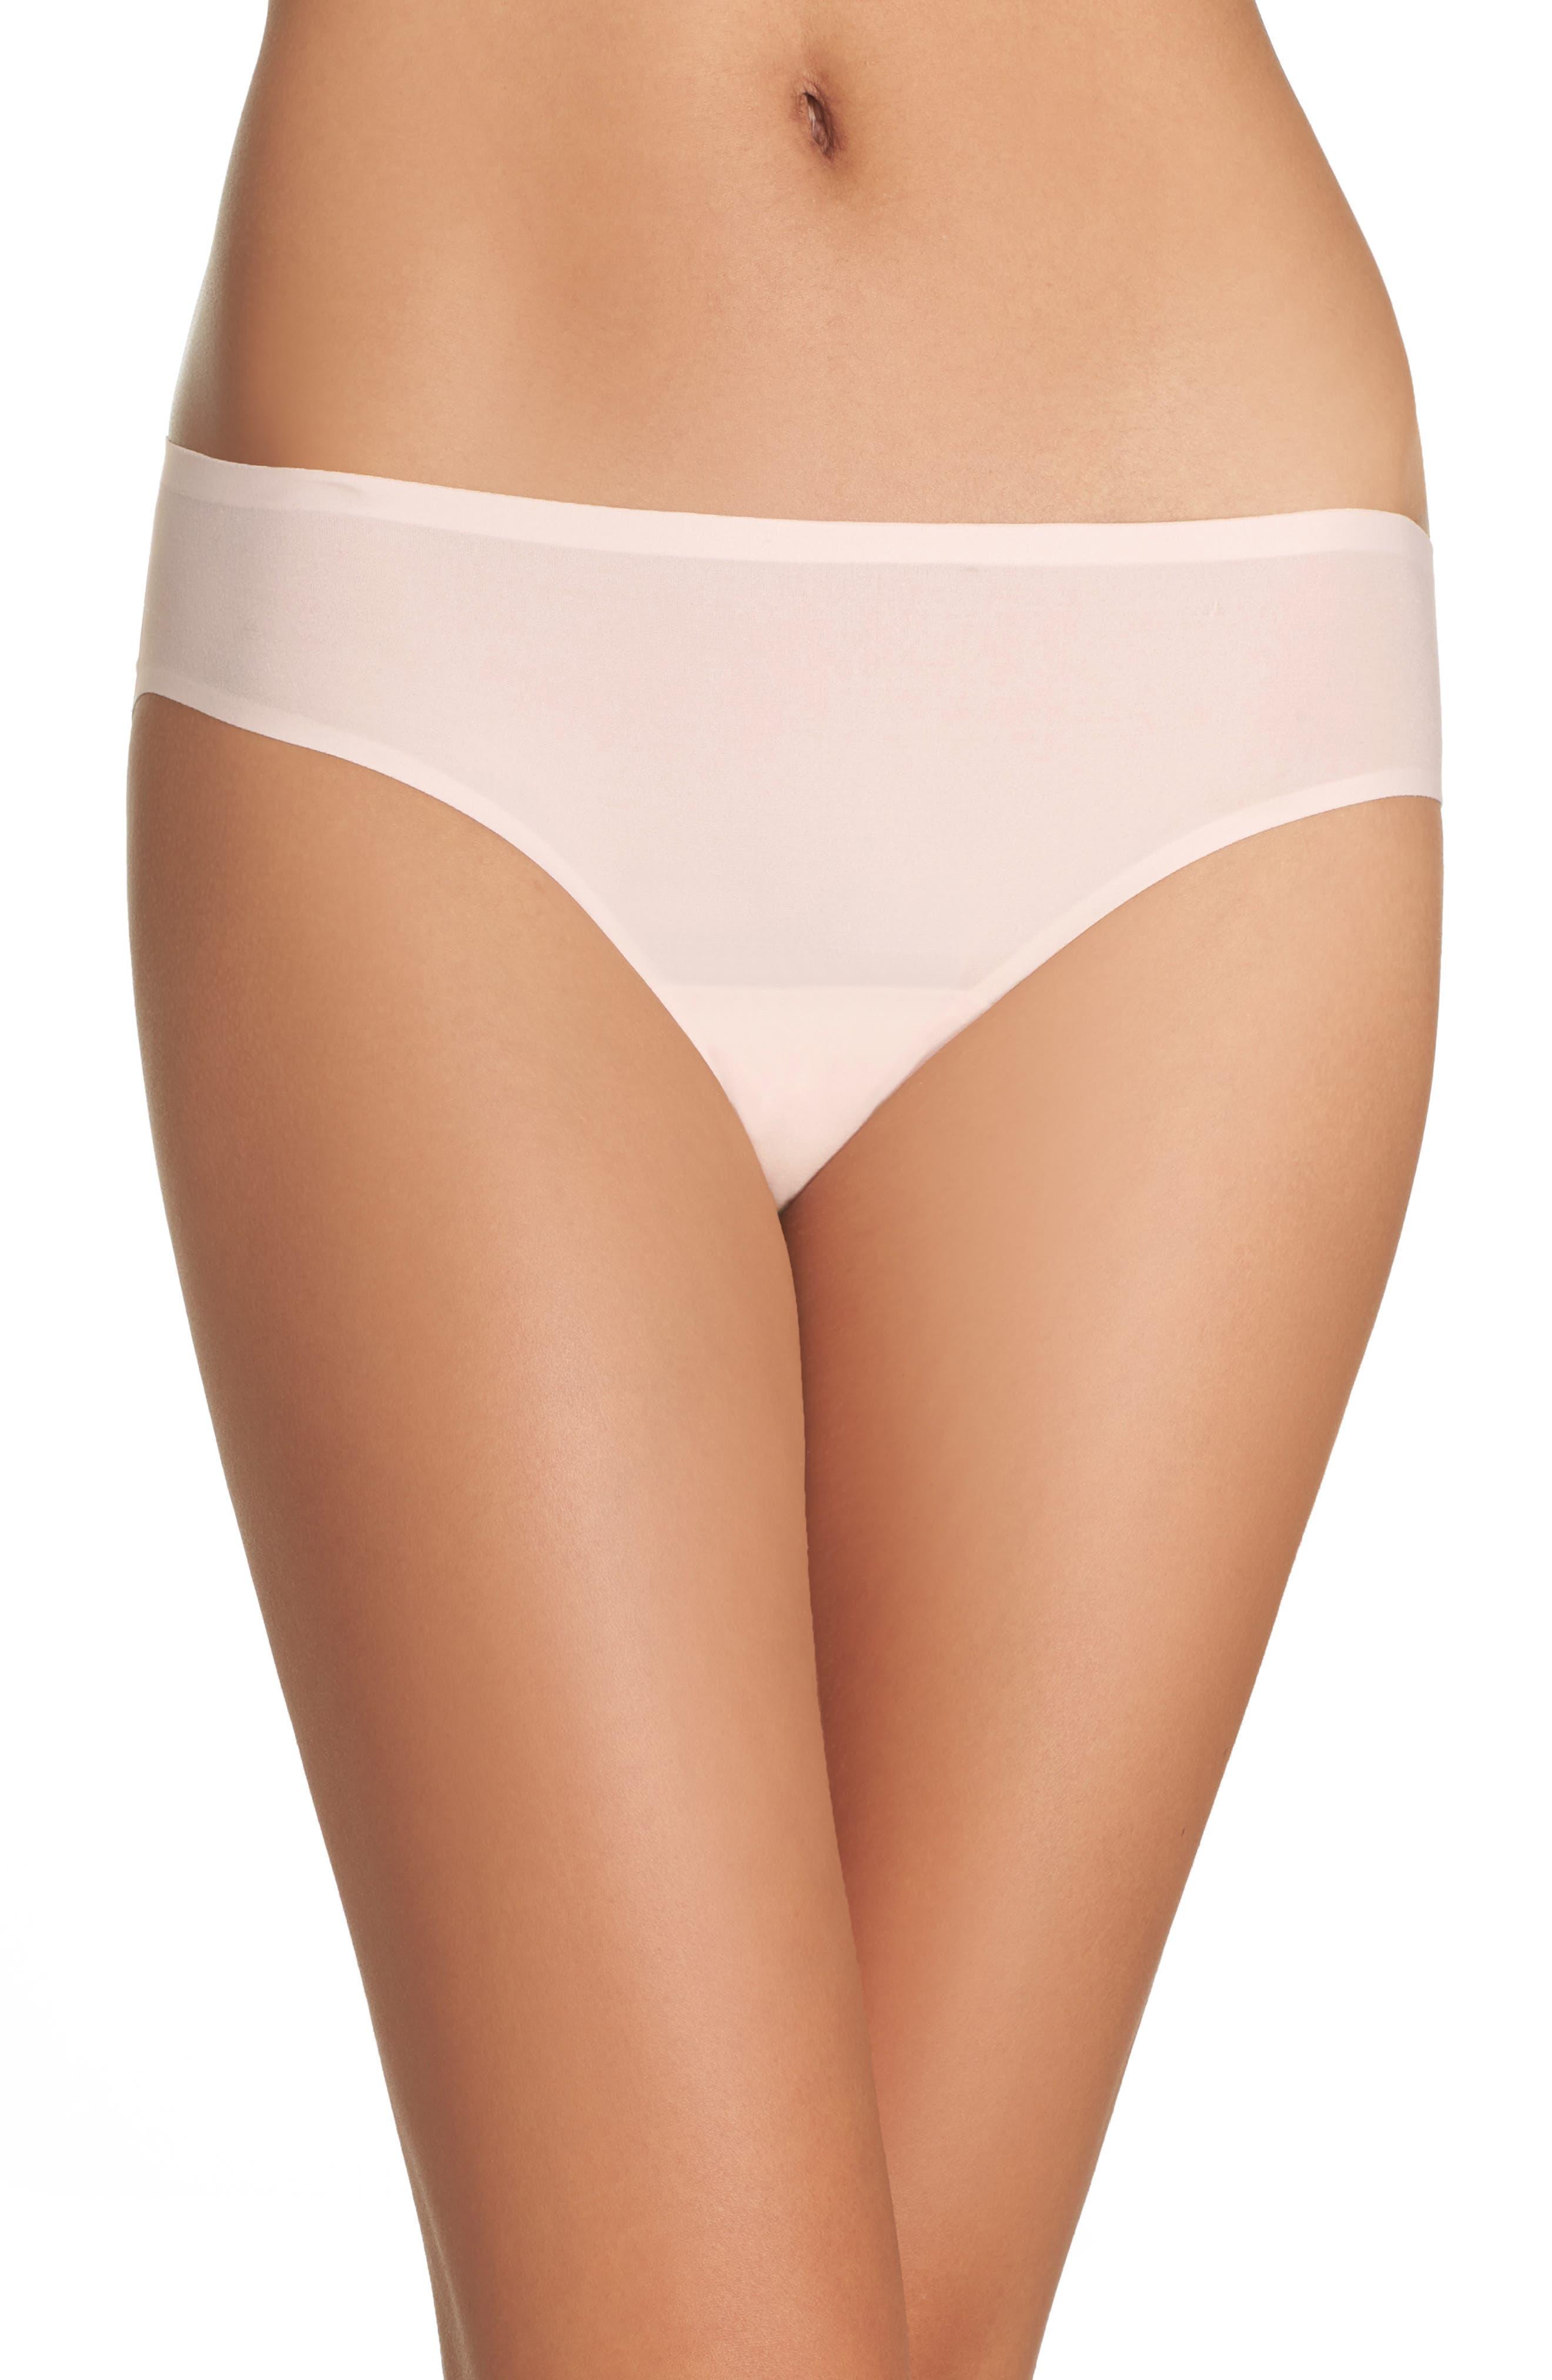 Main Image - Chantelle Intimates Soft Stretch Seamless Bikini (3 for $45)